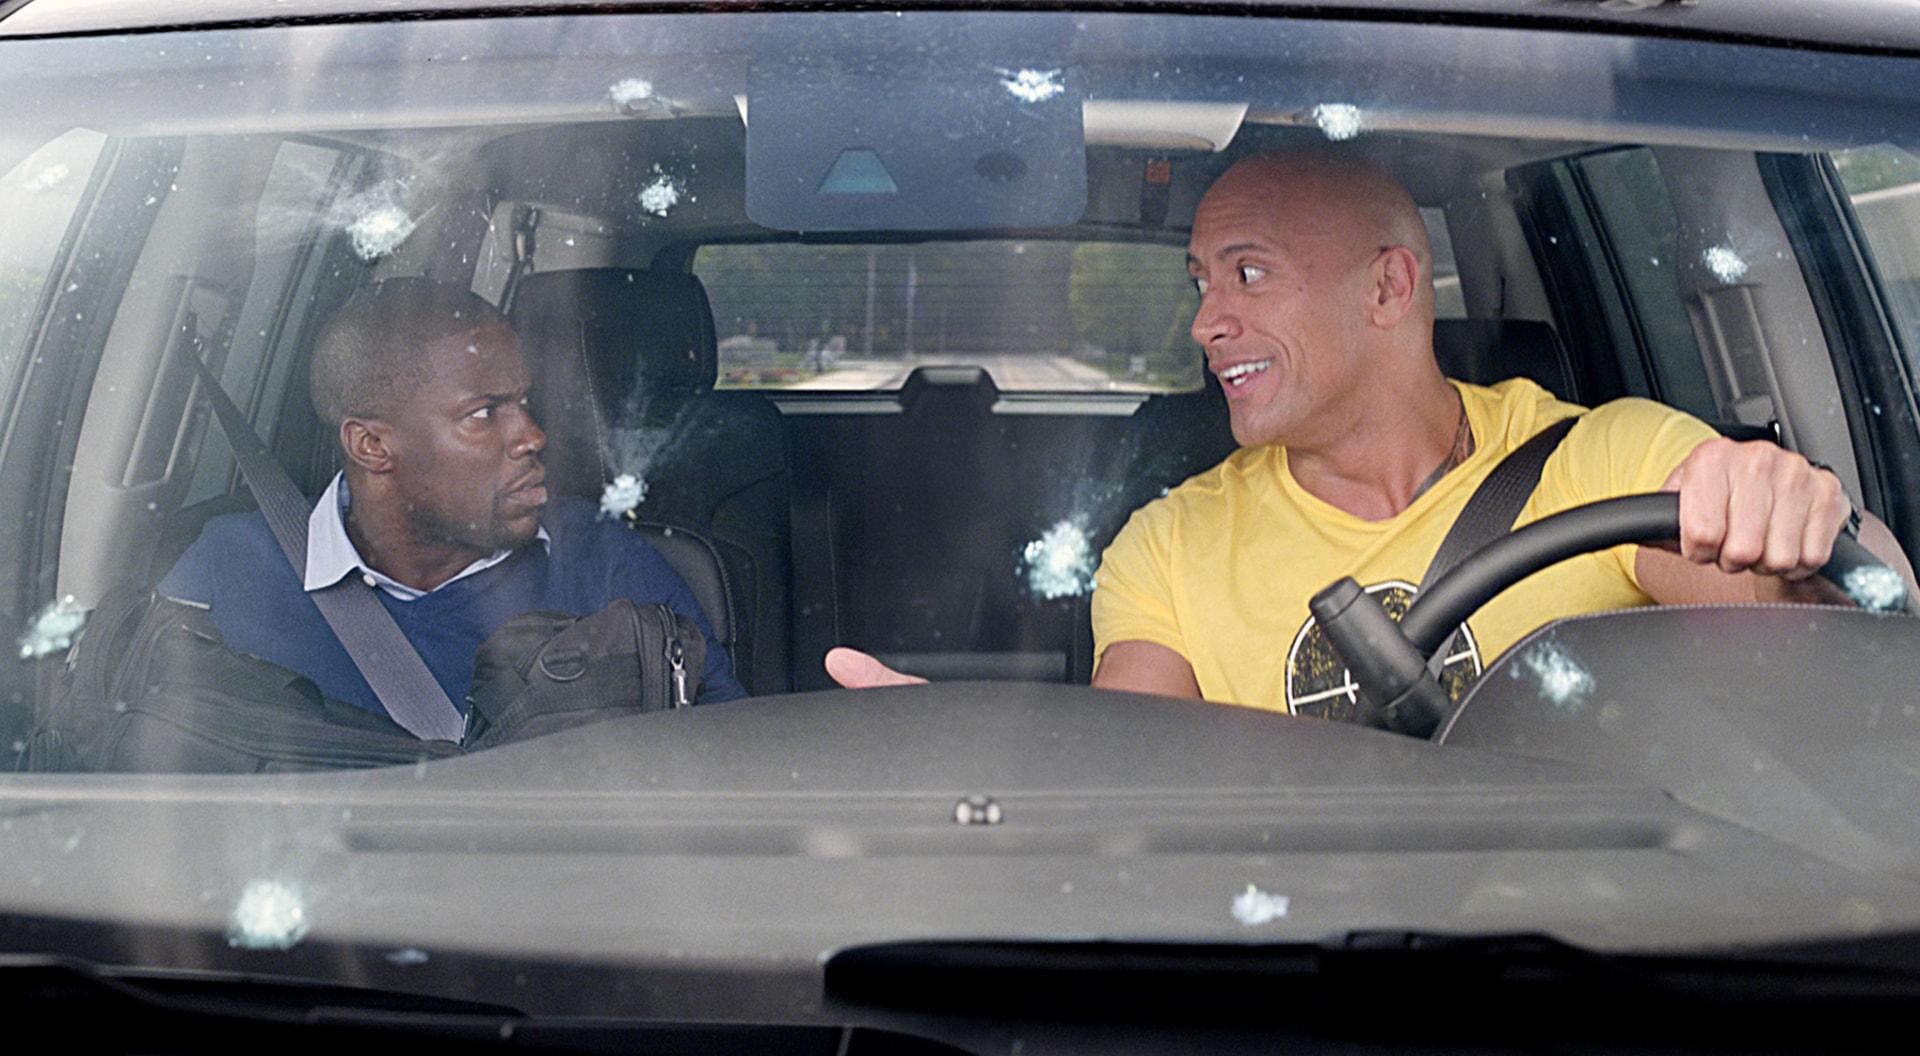 KEVIN HART as Calvin and DWAYNE JOHNSON as Bob in a car